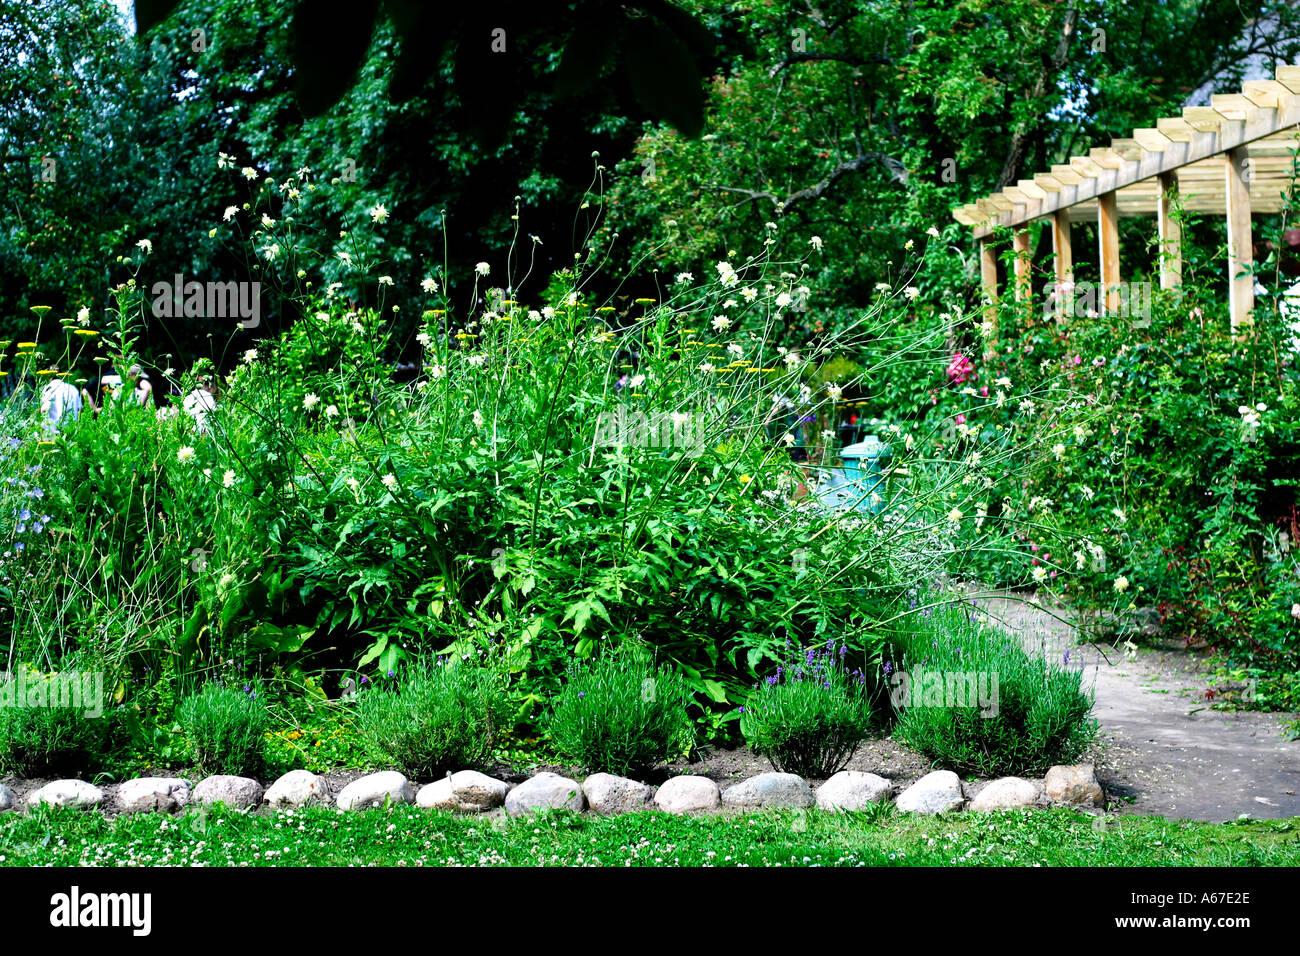 Charmant Herbgarden Stock Photos U0026 Herbgarden Stock Images   Alamy